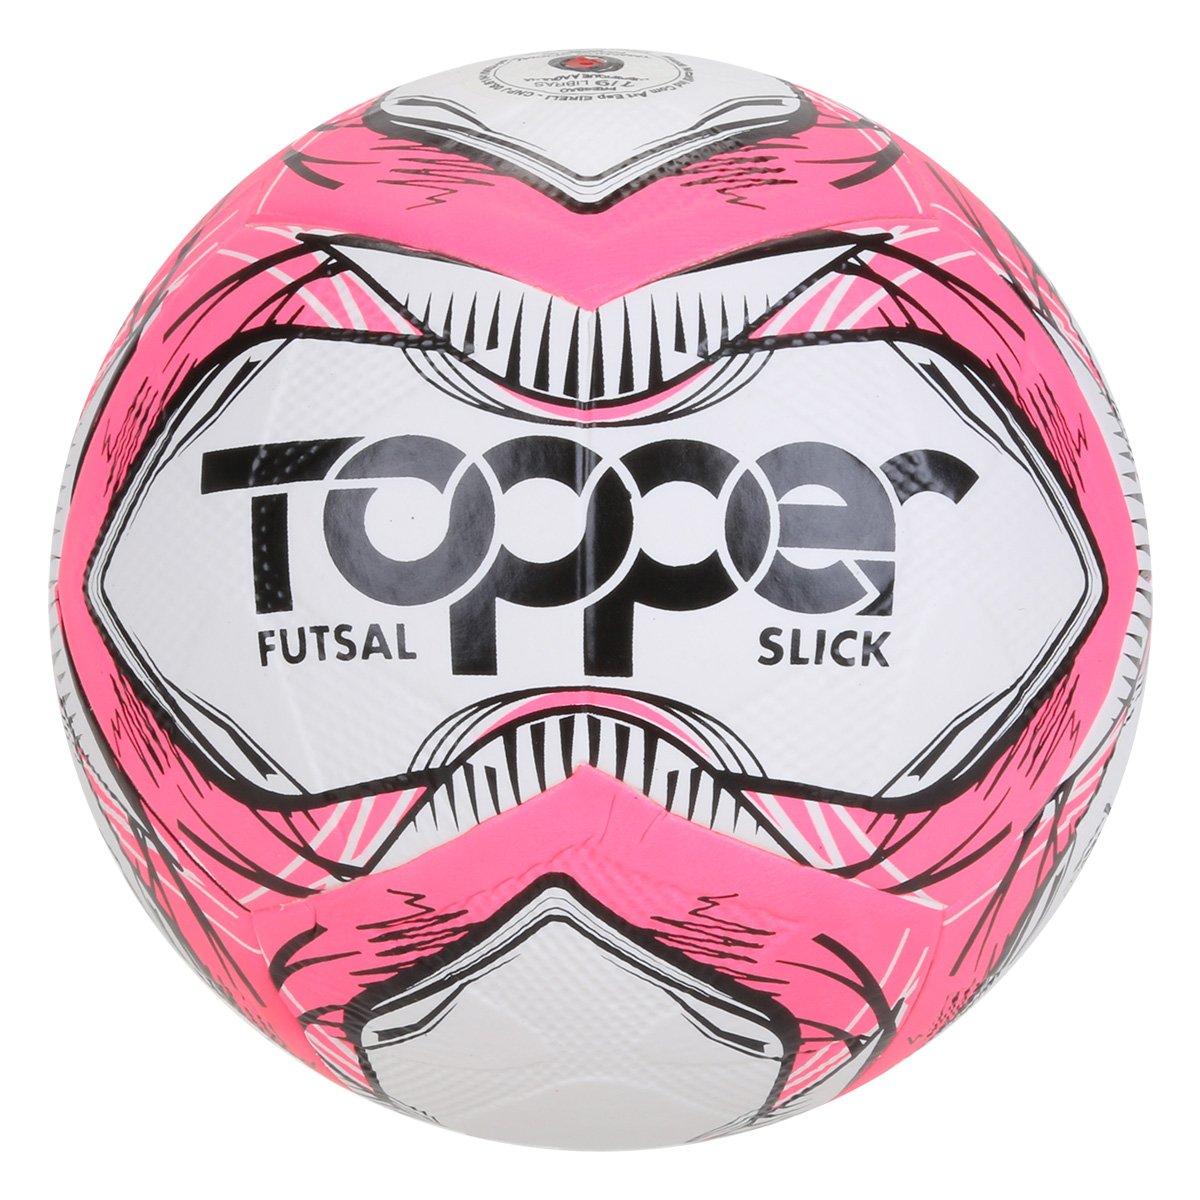 Bola de Futsal Topper Slick 2020